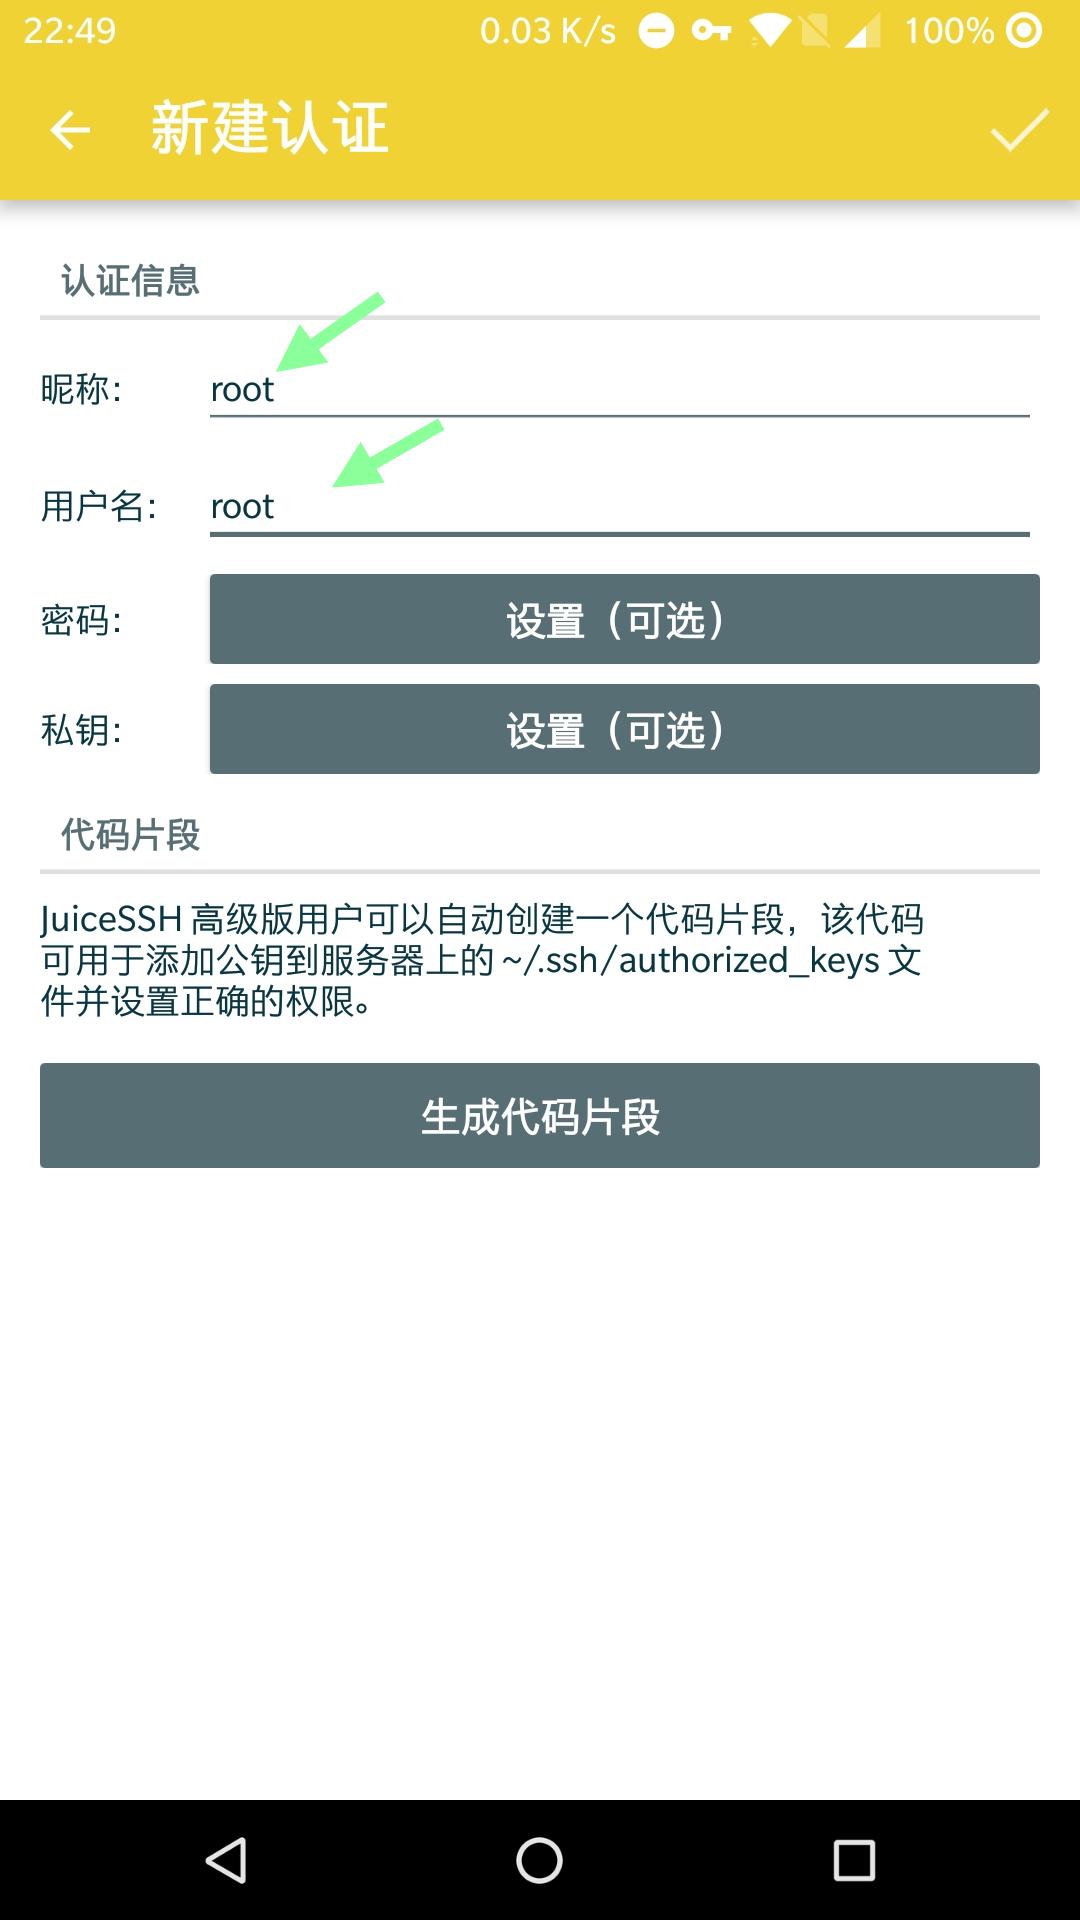 Screenshot_20180708-224940_1531062013010.png